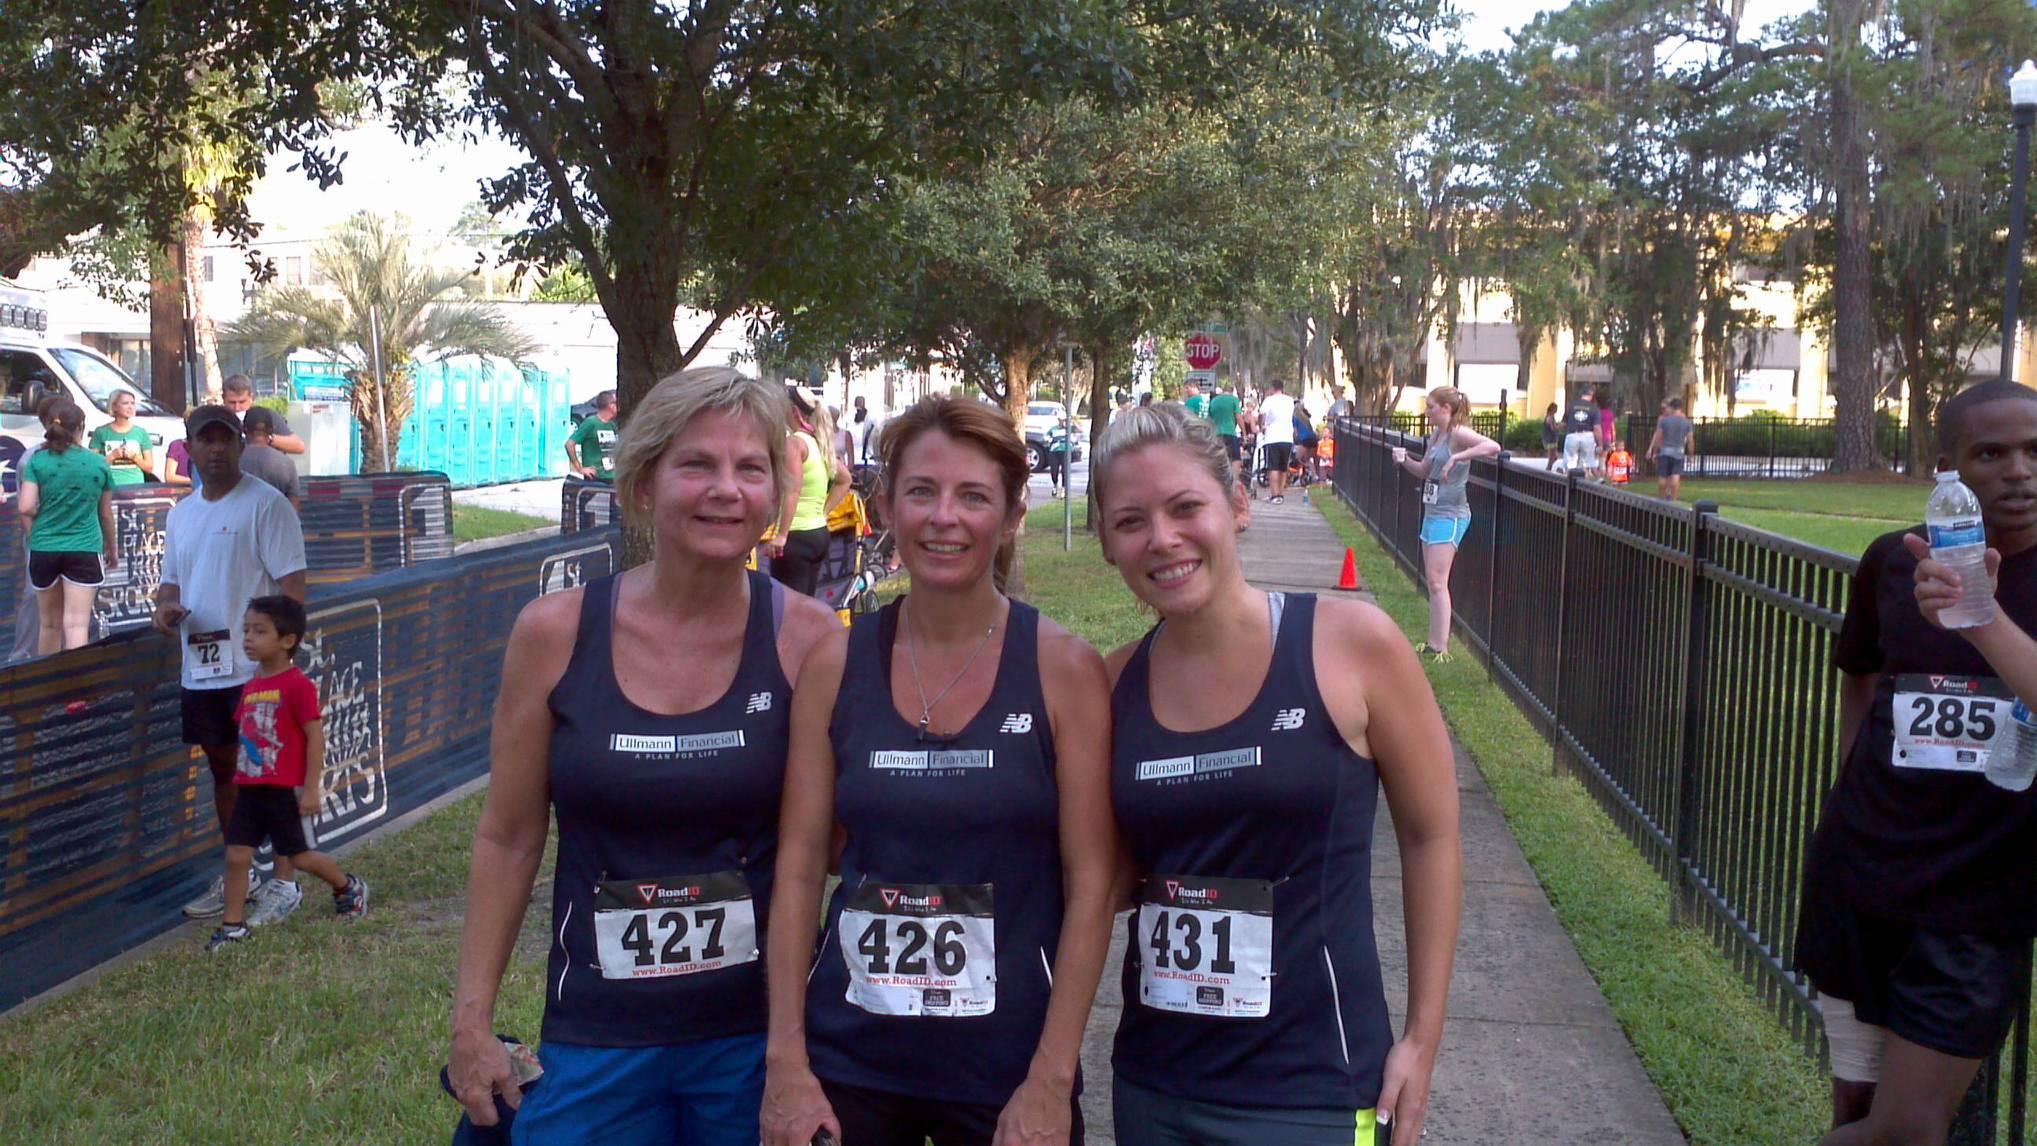 Shirt design jacksonville fl - Financial Planning Association 5k Run Jacksonville Fl T Shirt Photo